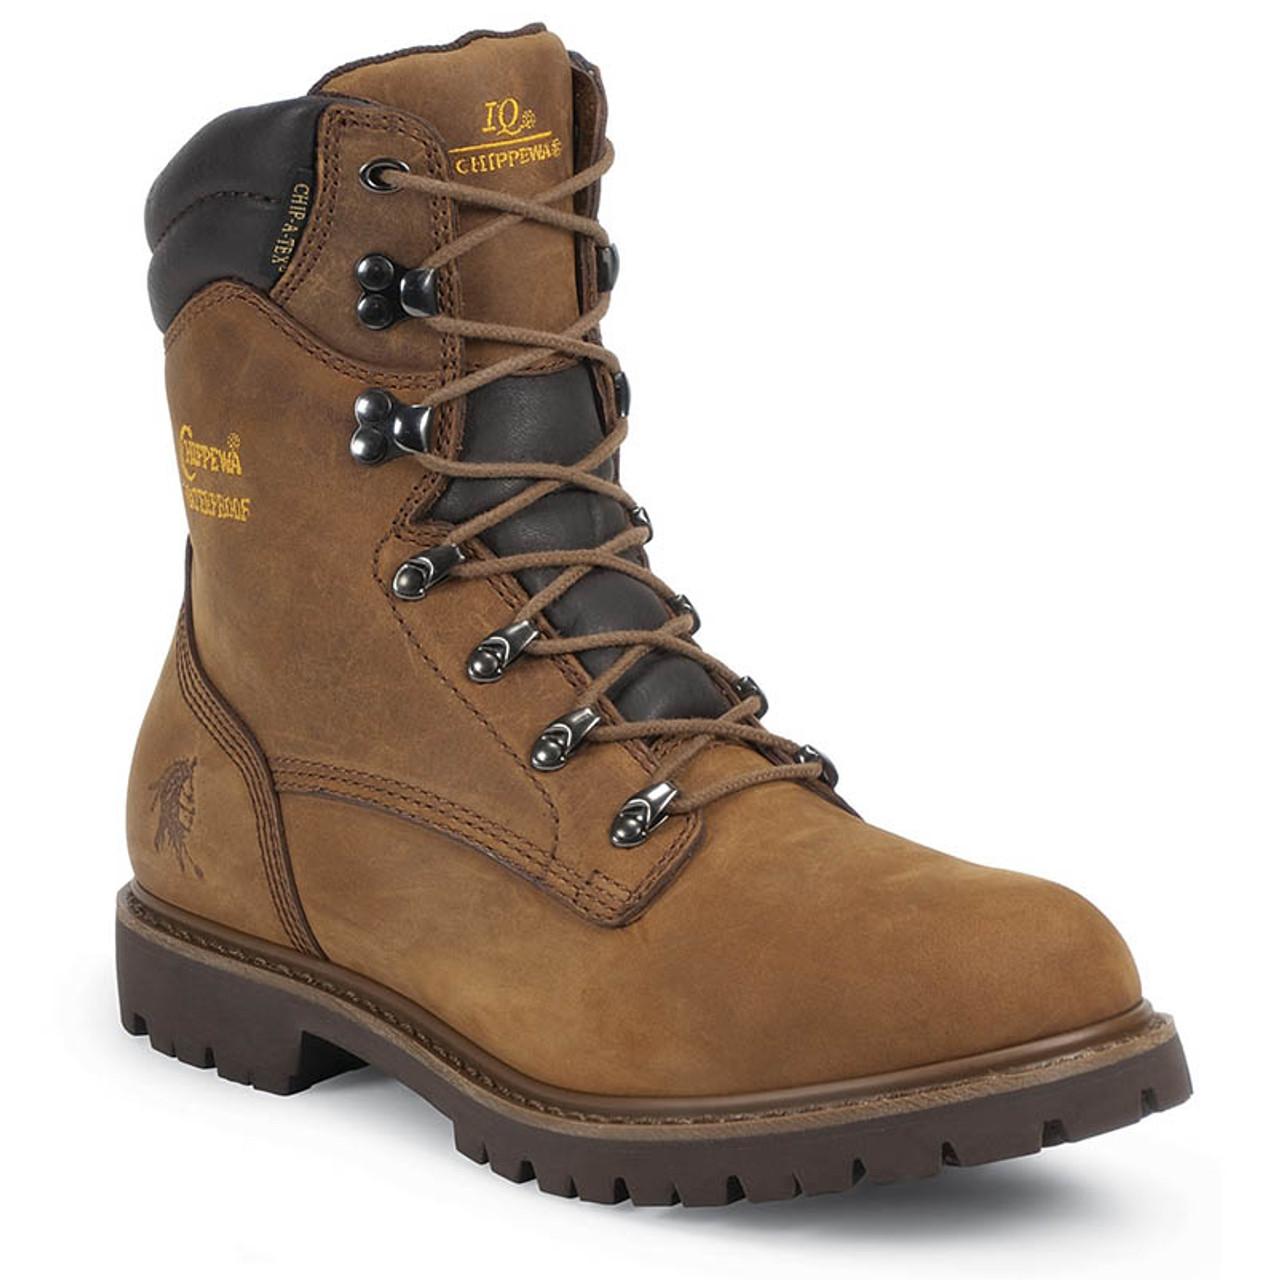 593de0b93da Chippewa 55068 BIRKHEAD Soft Toe 400g Insulated Heavy Duty Work Boots